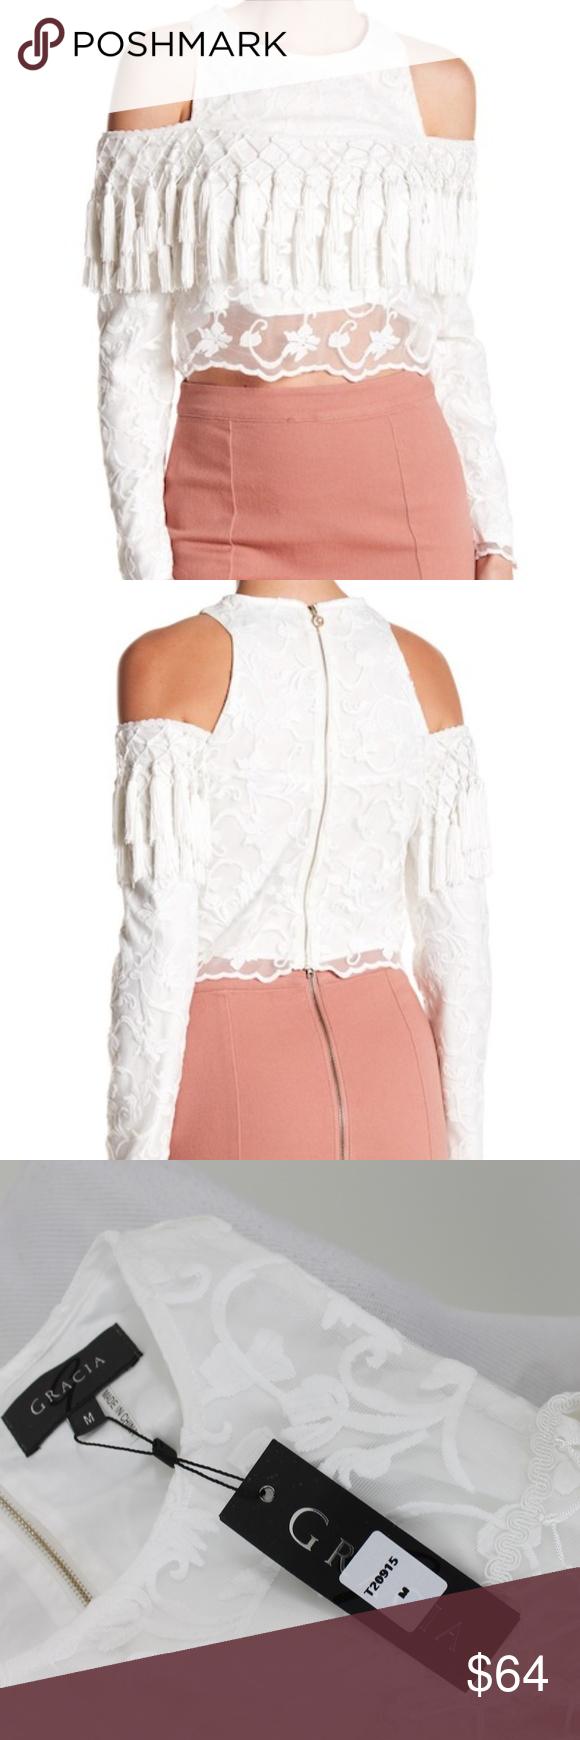 06056b762e6956 New Gracia Lace Cold Shoulder Tassel Top White M New Women's Gracia Lace Top-  $129 Cold shoulder- Back zipper- Fully lined- Tassel detail White 100% ...